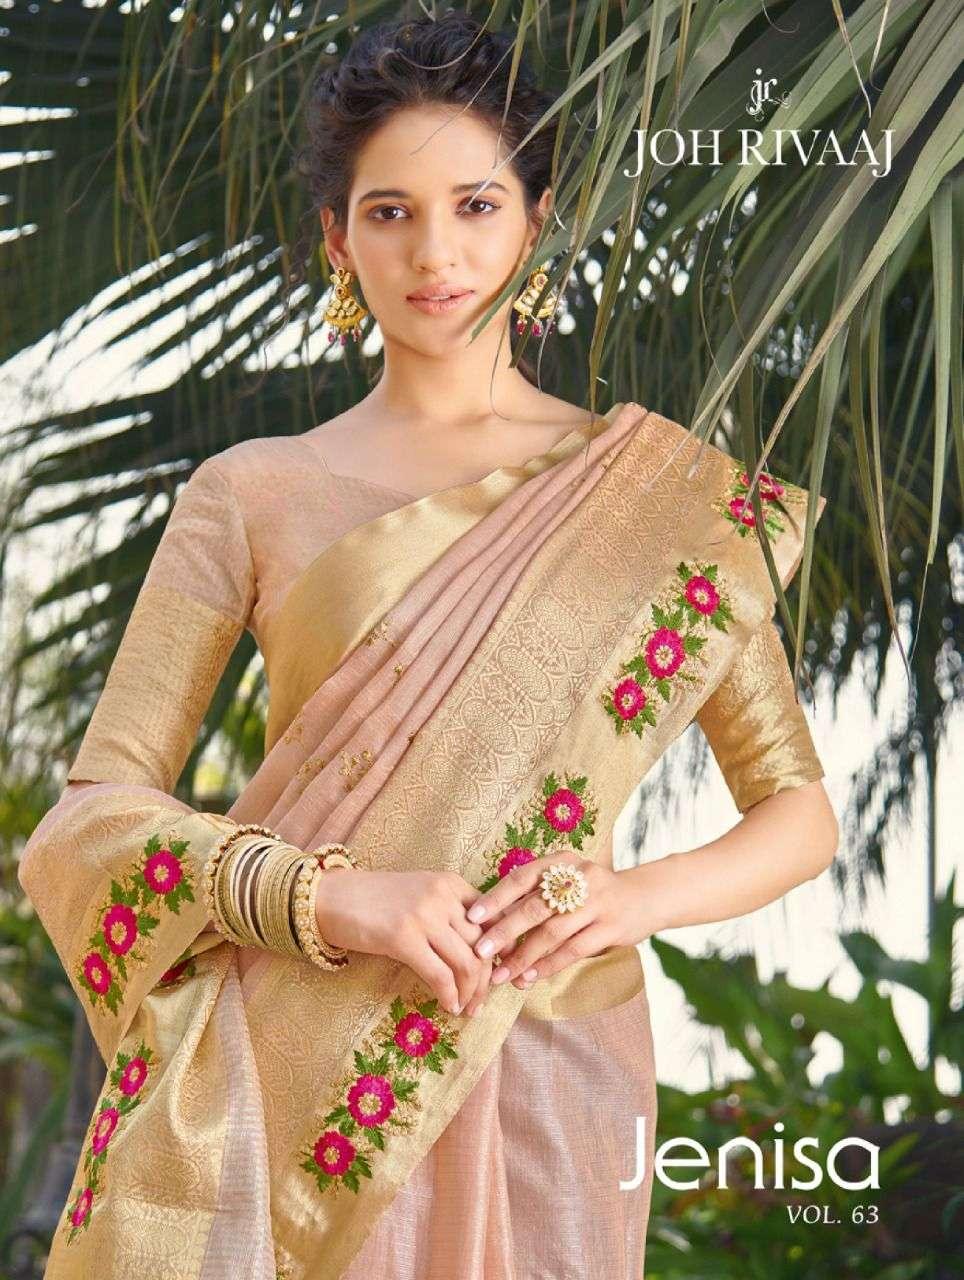 Joh Rivaaj Jenisa Vol 63 Exclusive Designer Party Wear Saree Catalog Wholesaler